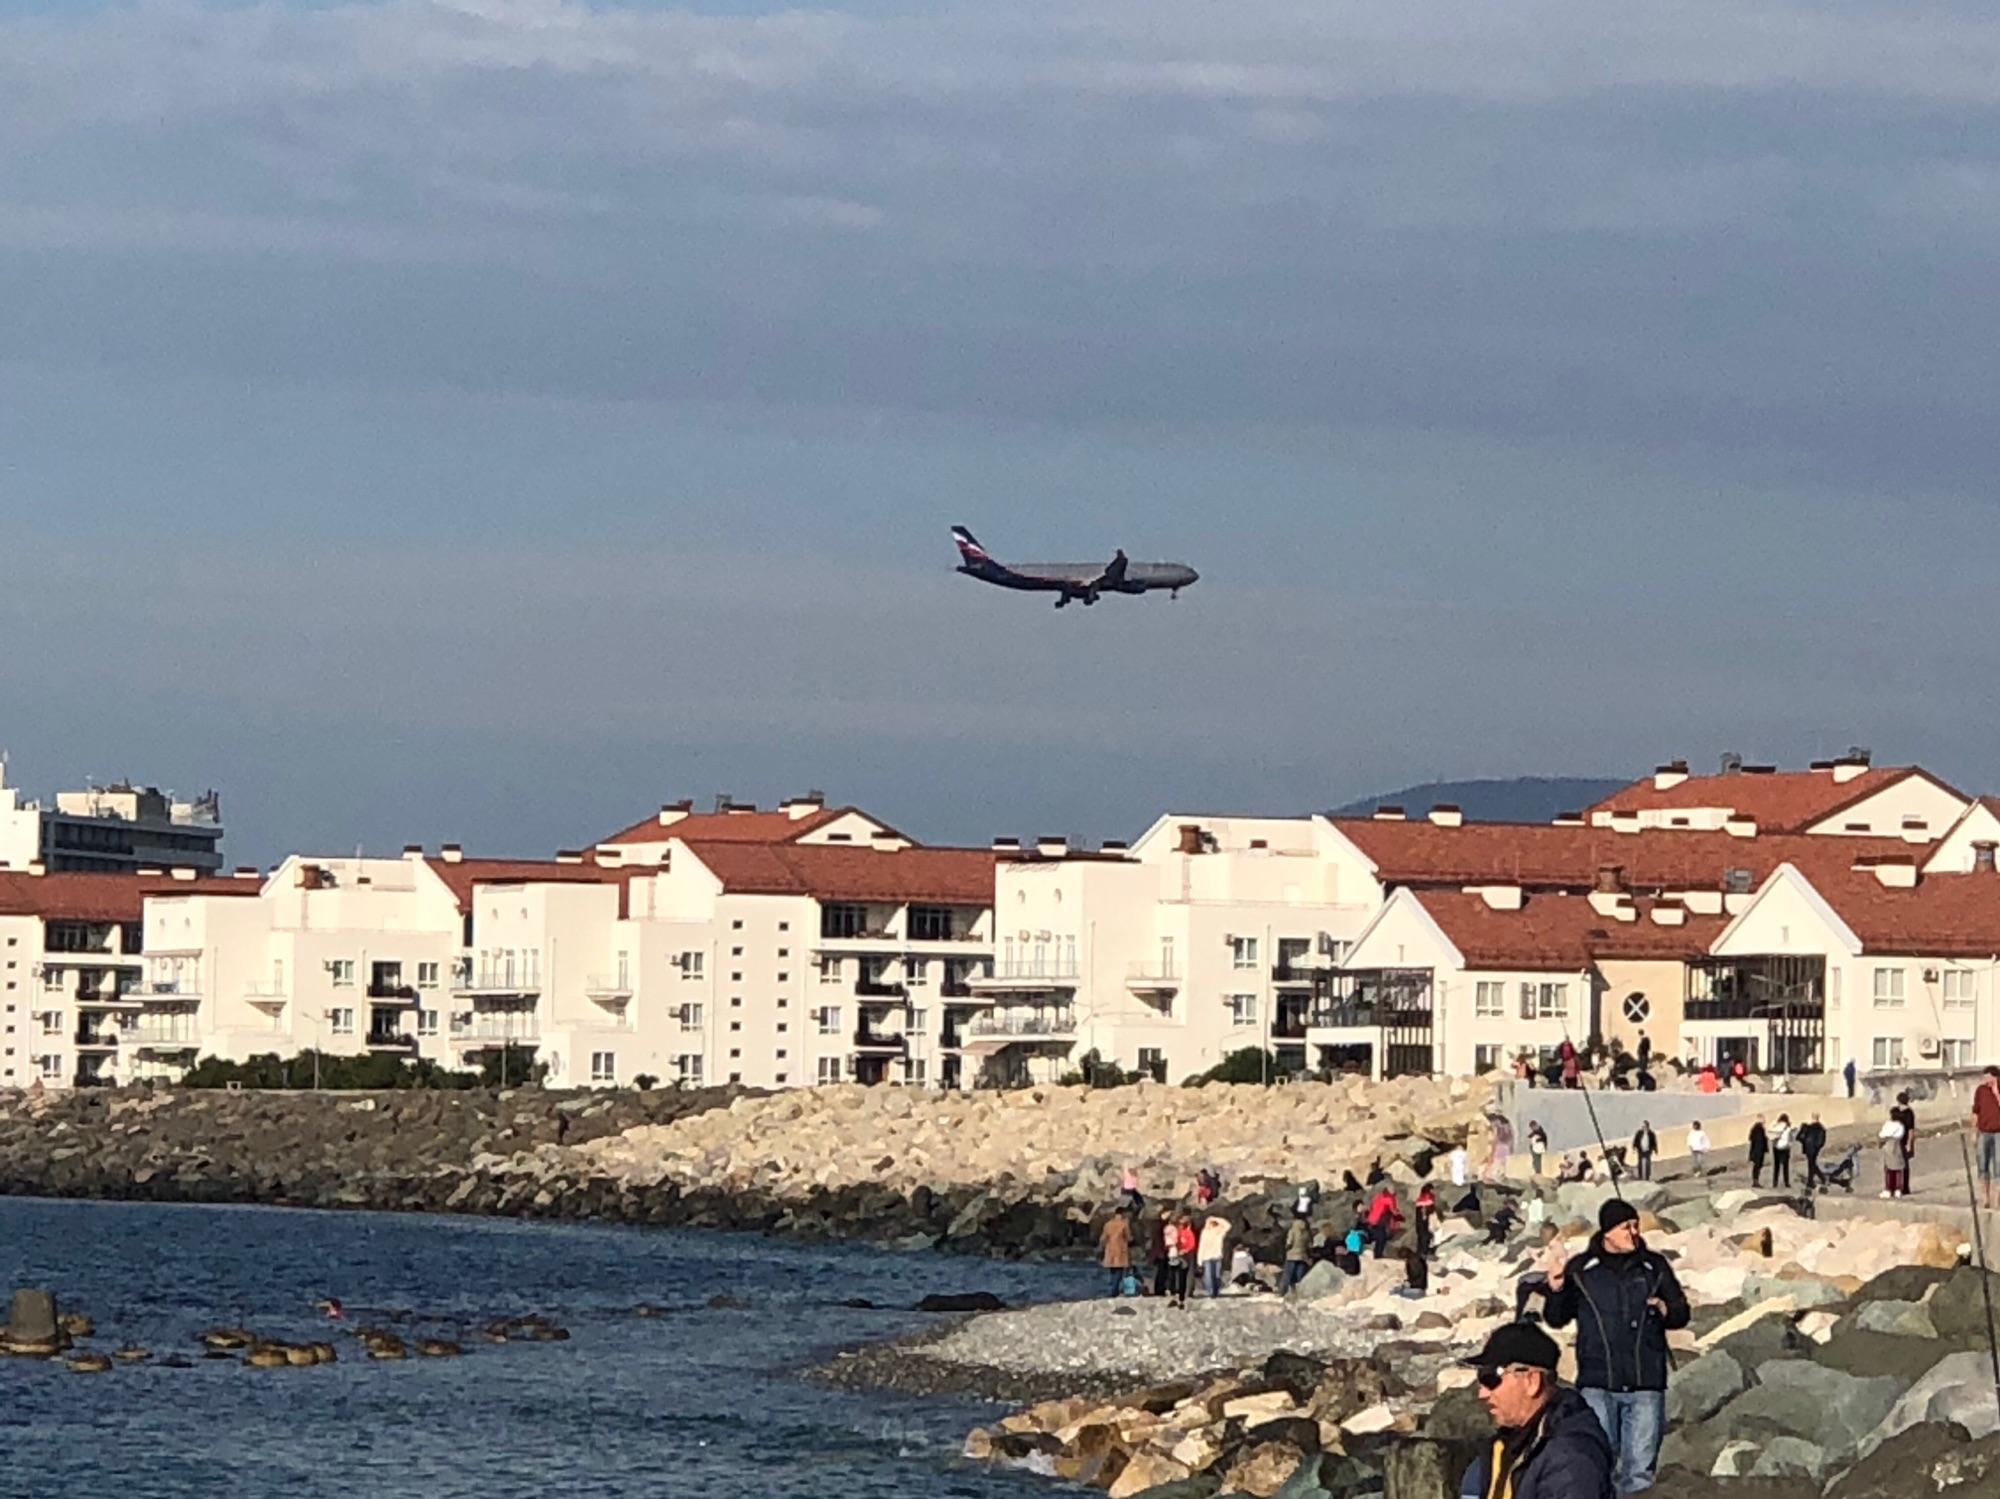 Берег моря, самолёт приземляется